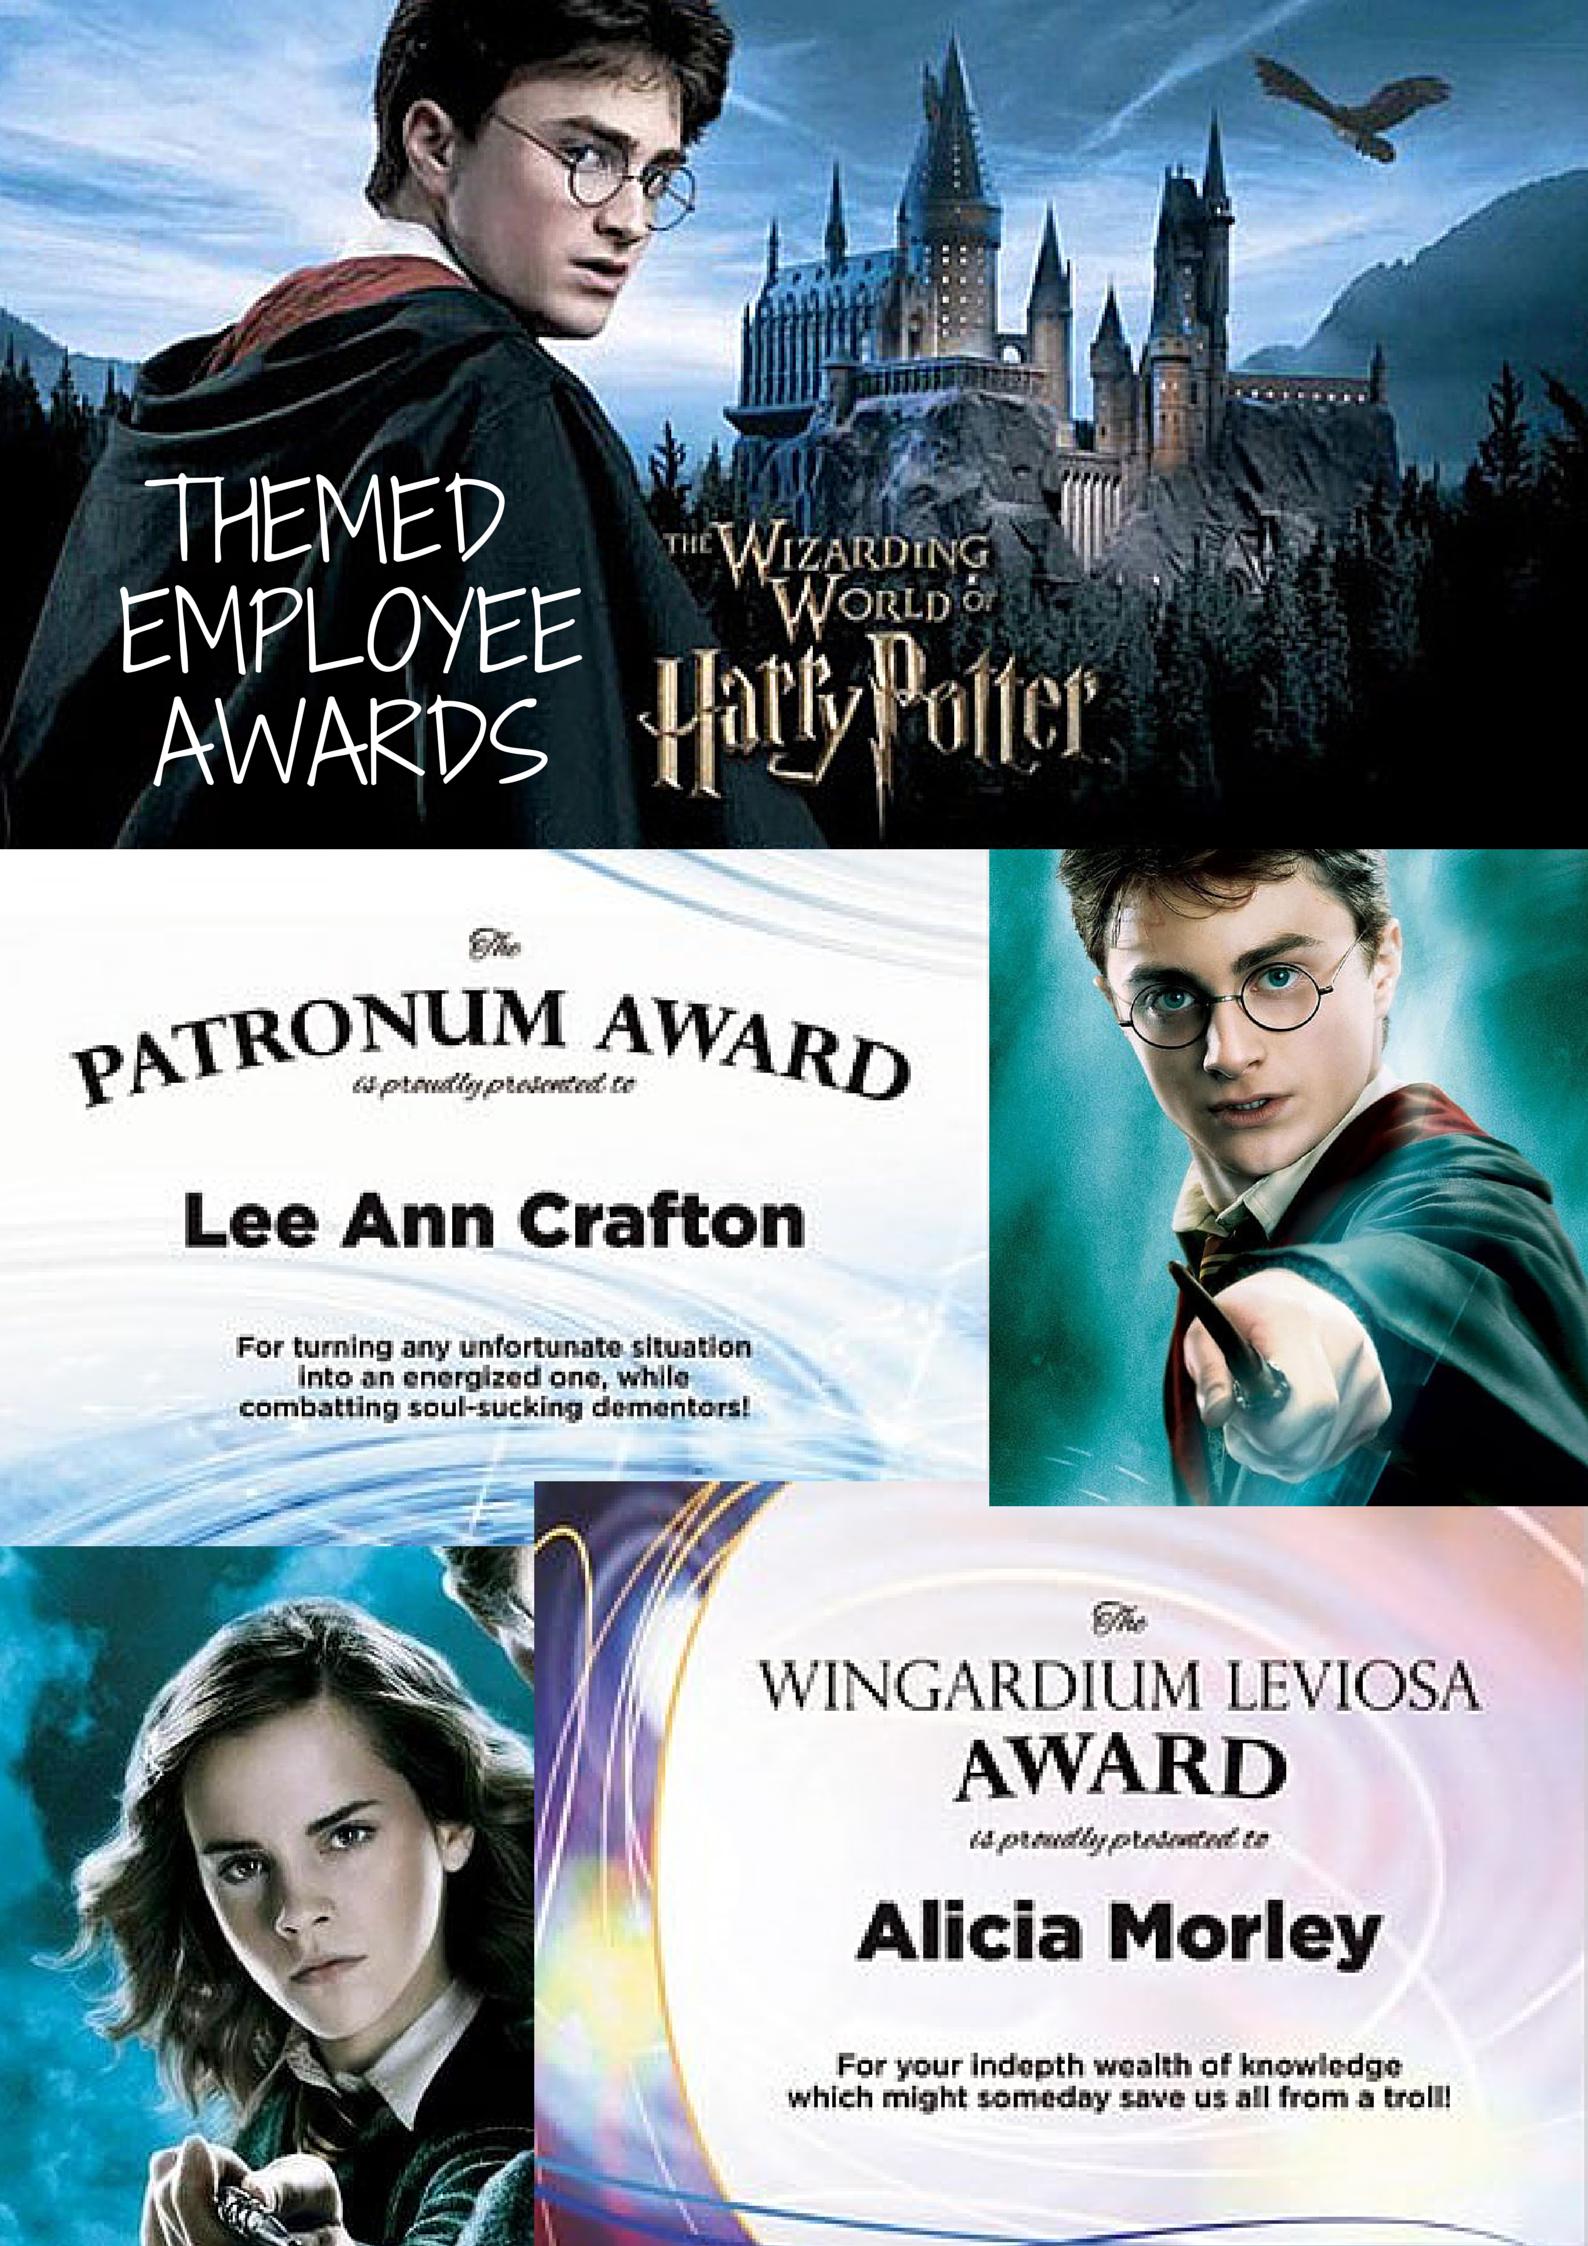 Office Award Ideas For Harry Potter Enthusiasts Employee Awards Employee Recognition Office Awards